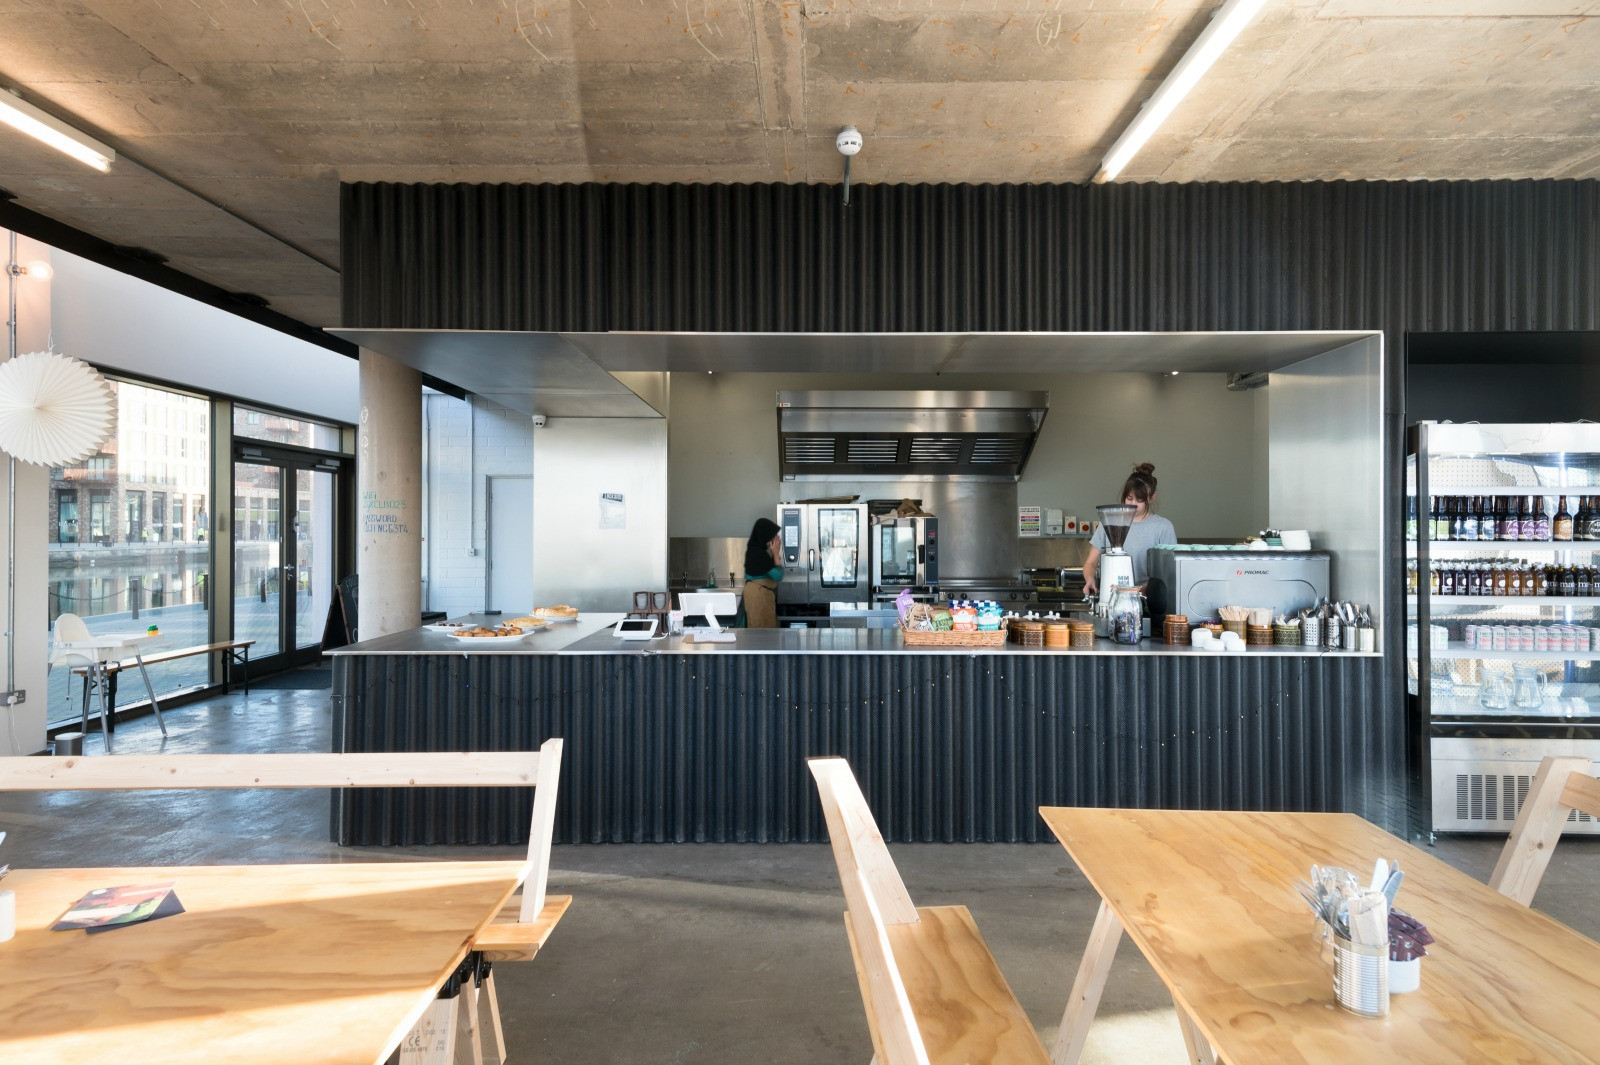 Inside the Lockside Kitchen